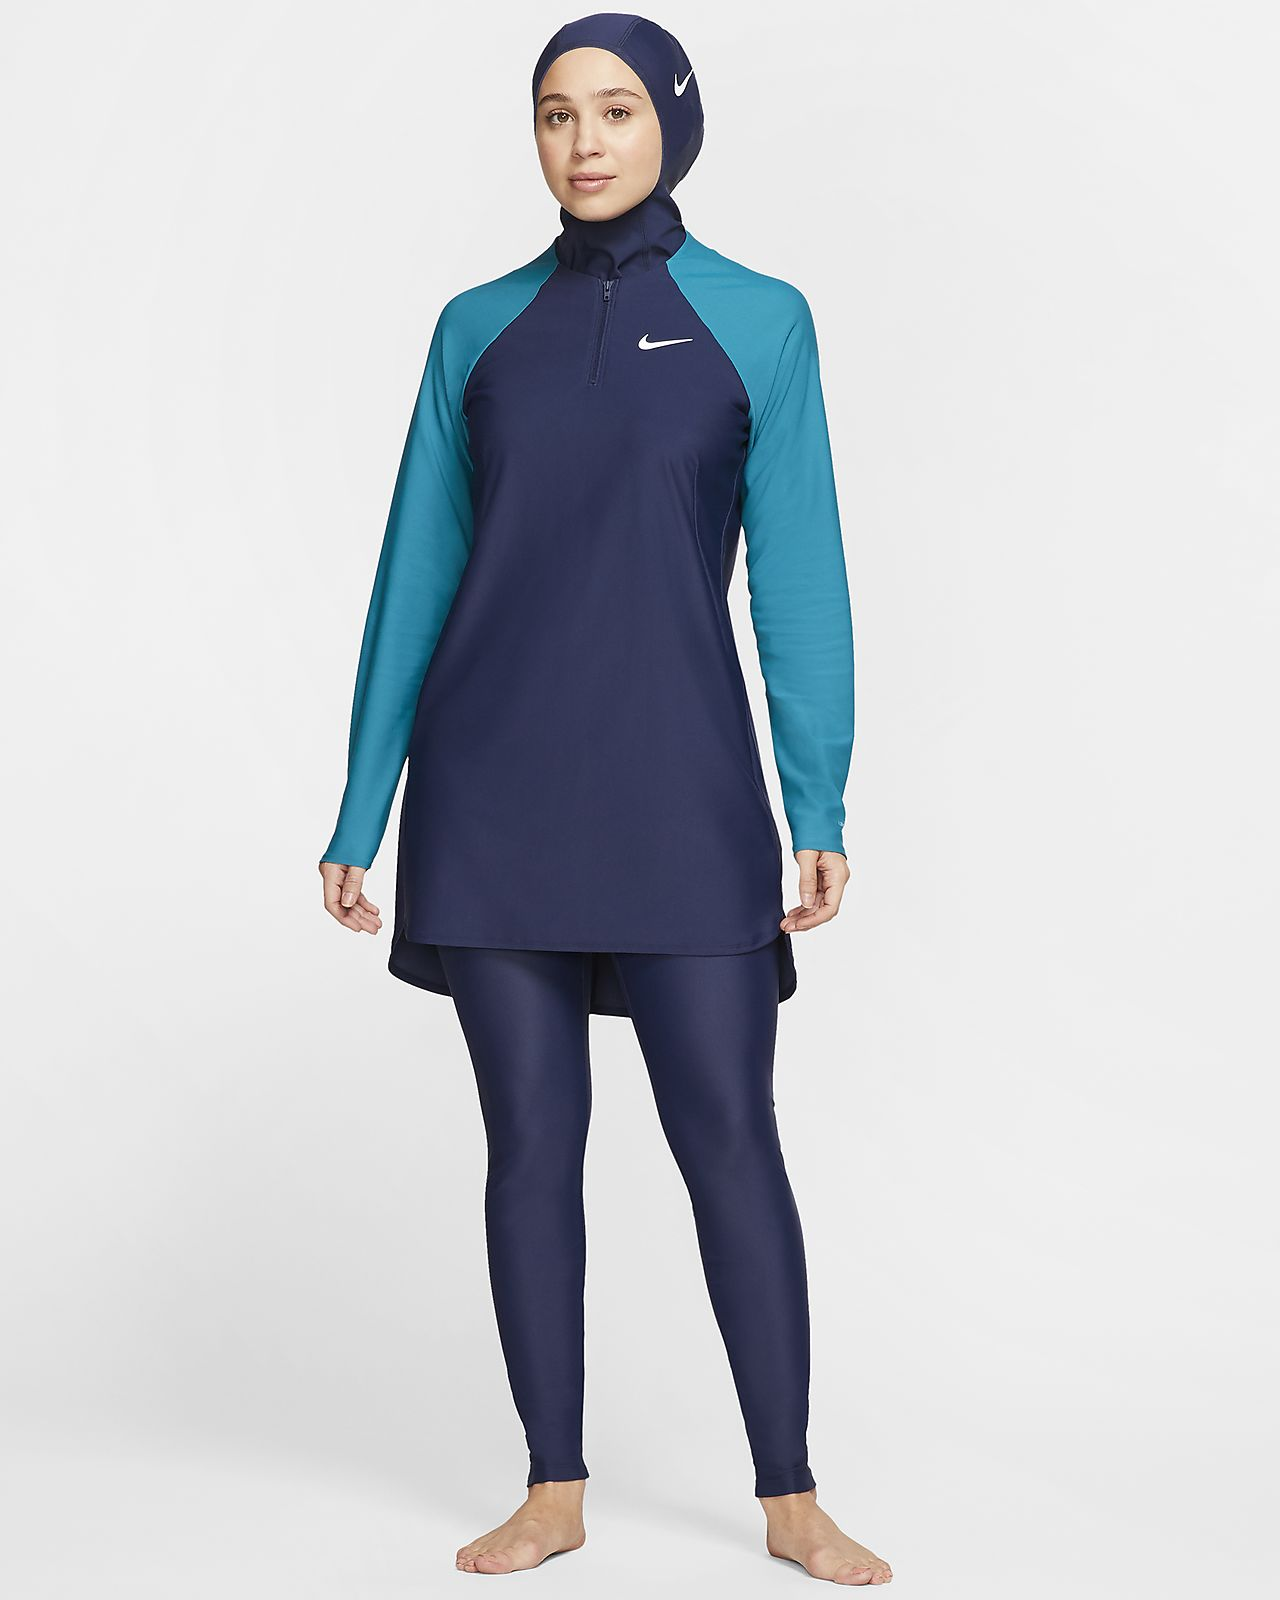 Nike Victory Women's Full-Coverage Slim Swim Pants